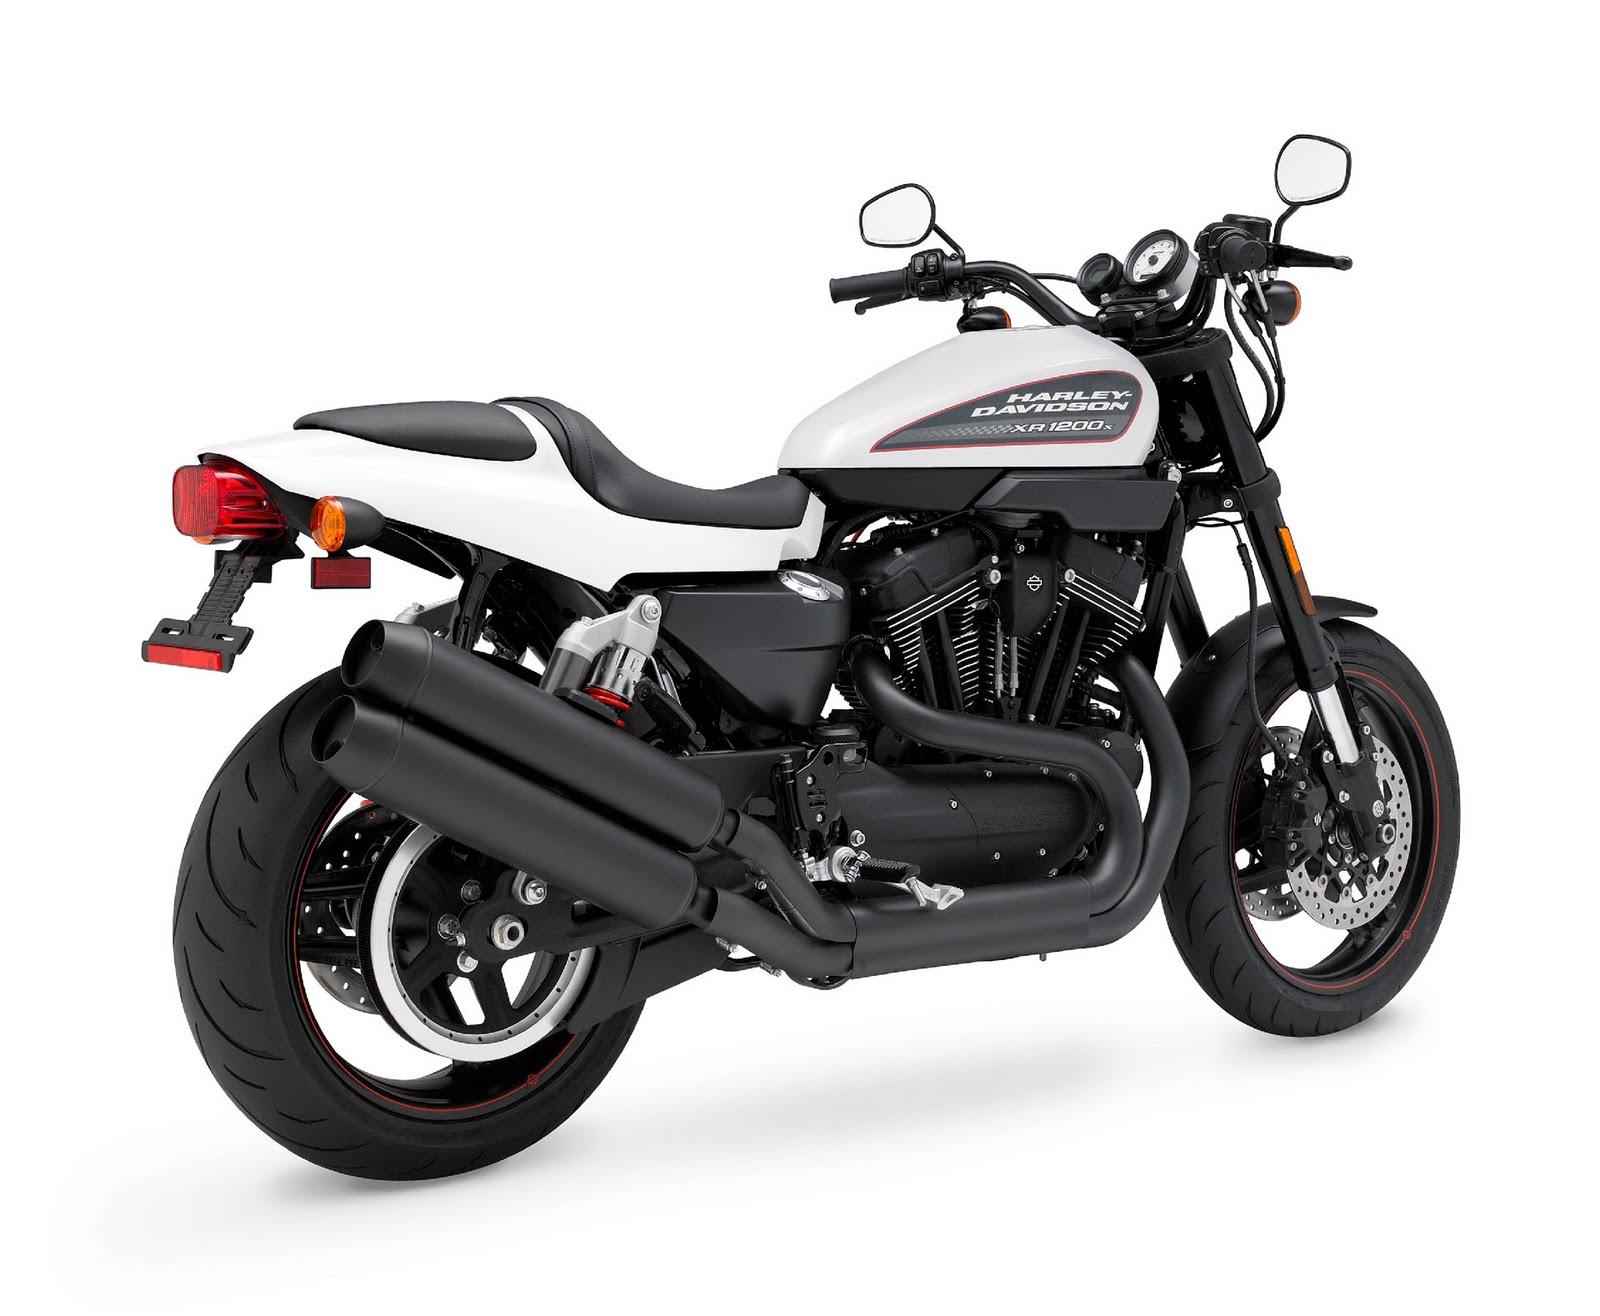 Motorcycle Modifications Harley Davidson XRX